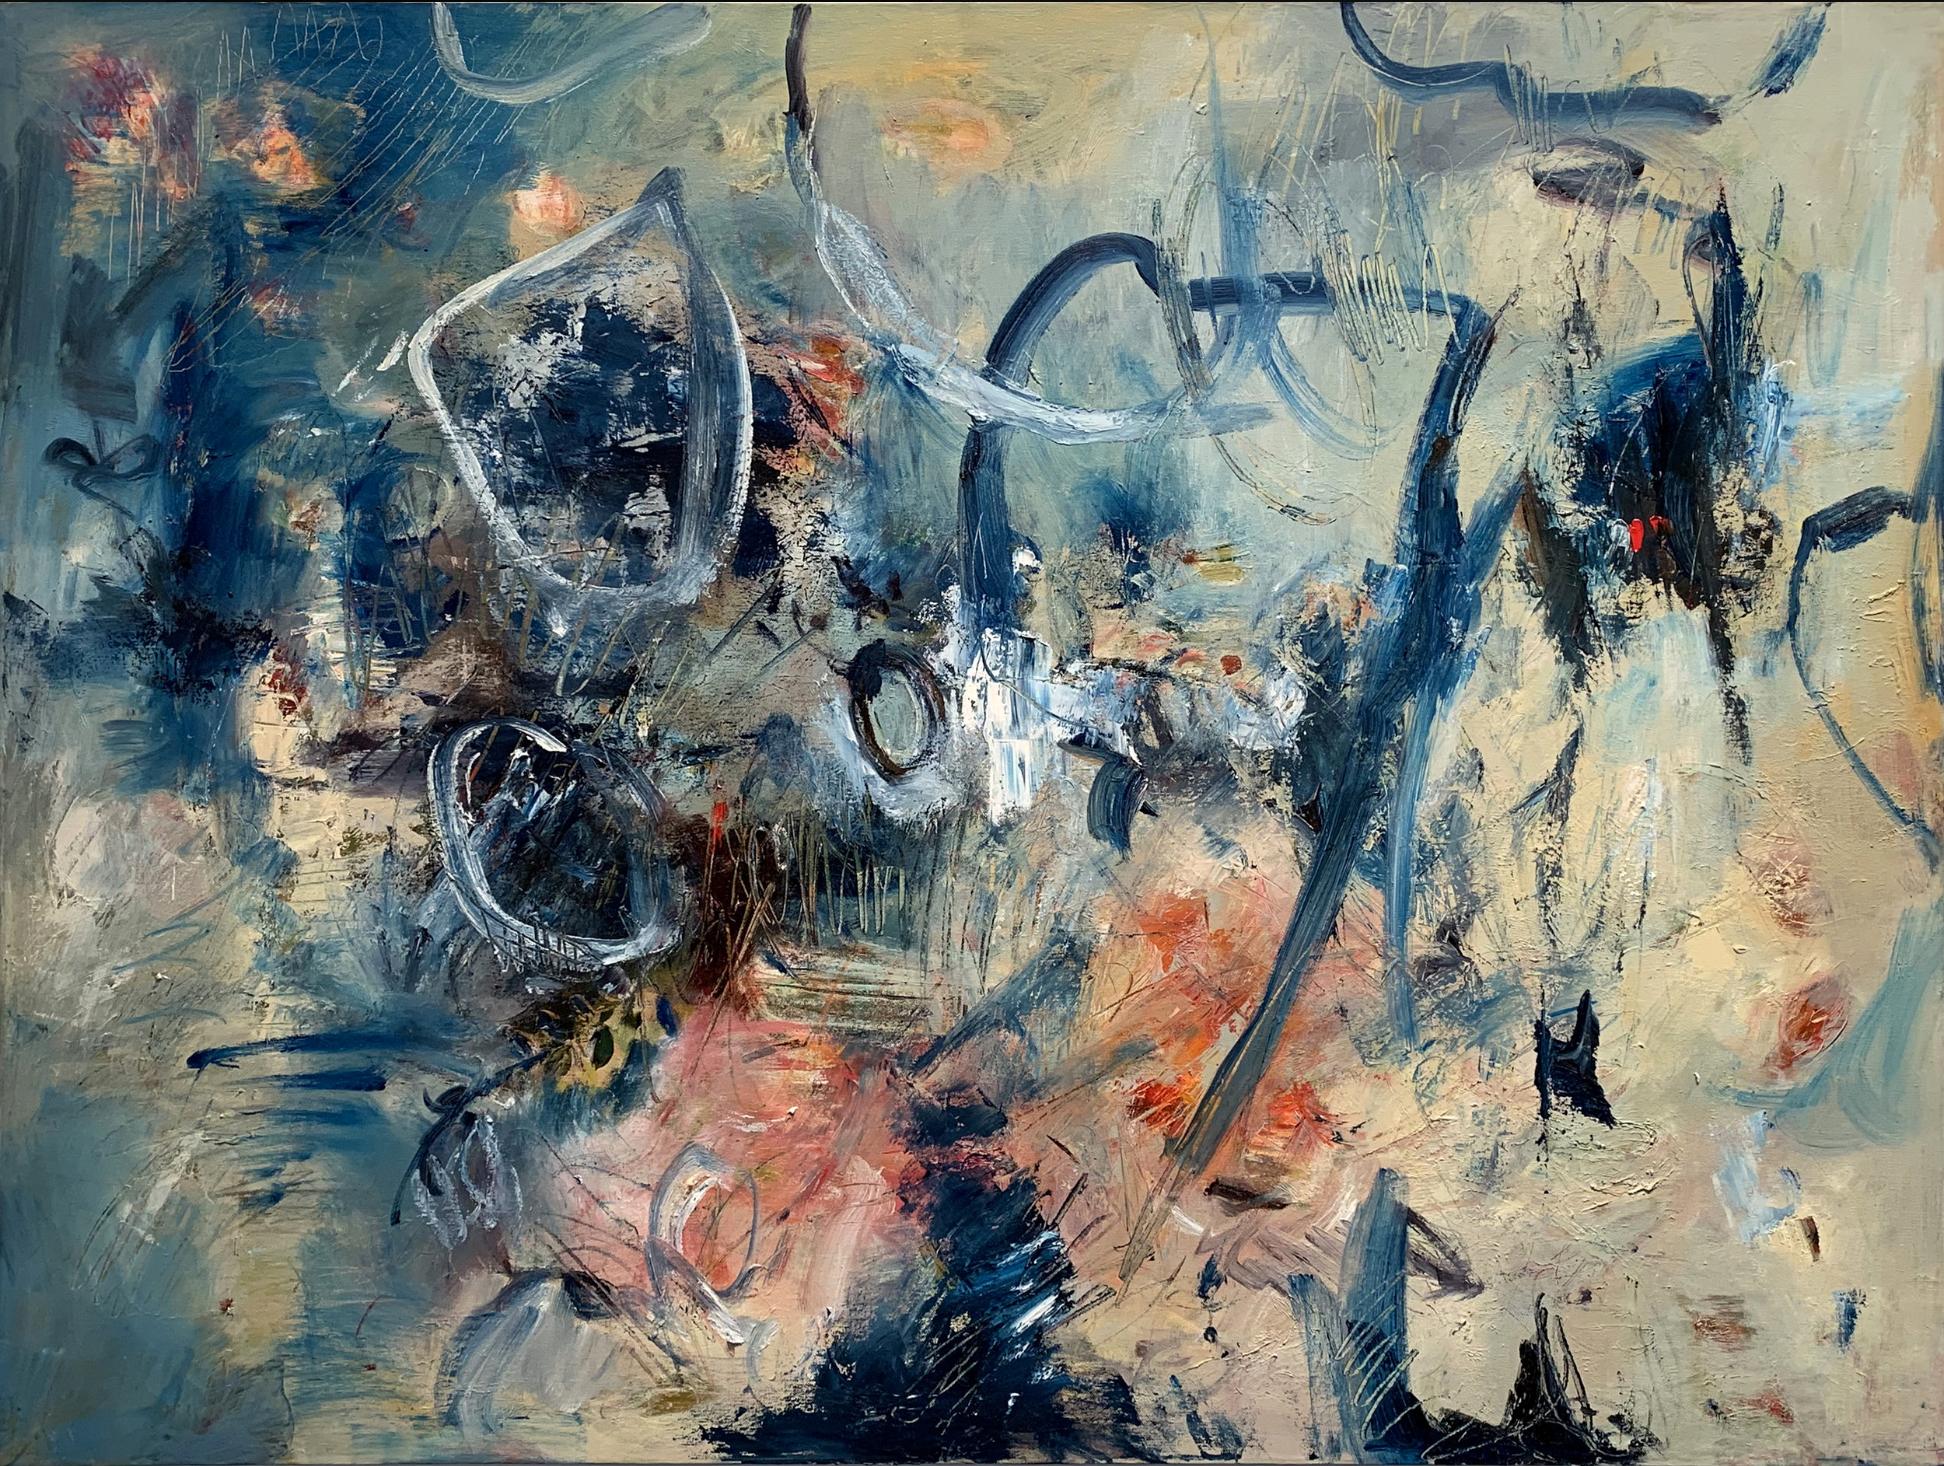 'Untitled', 2019, Mildred Jarrett